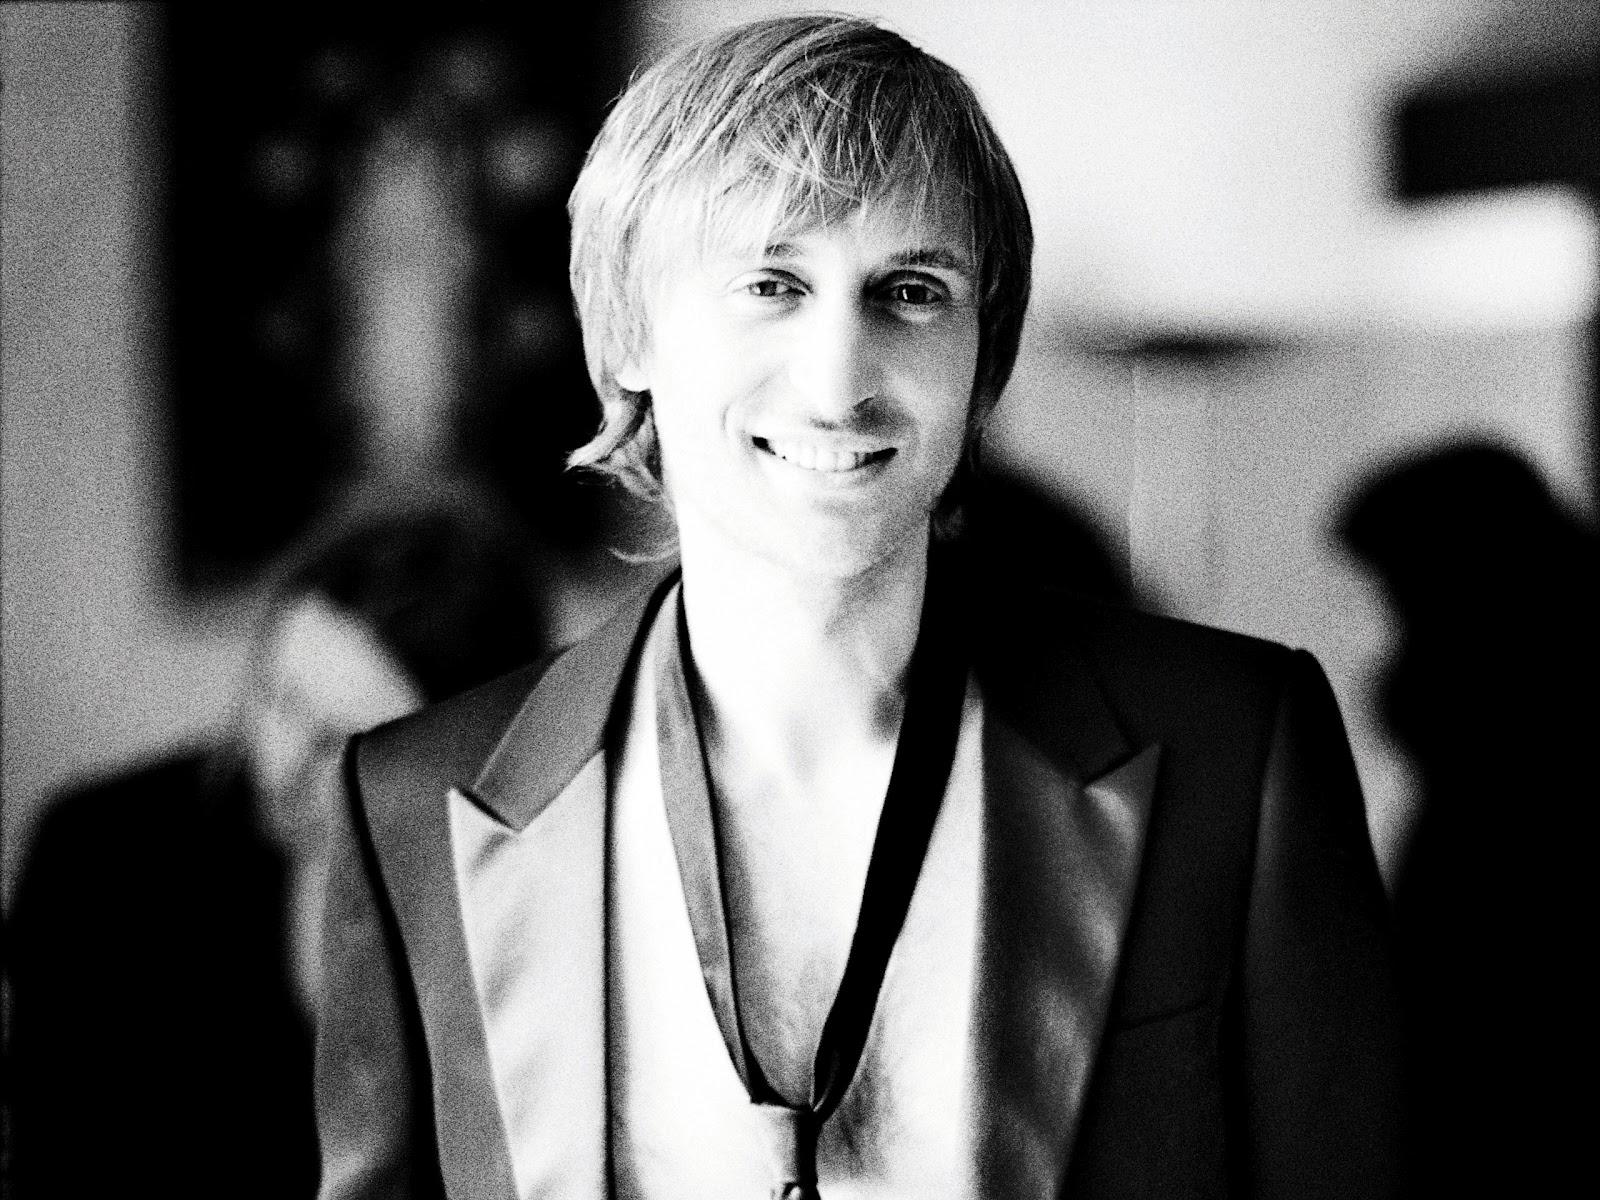 30 Best David Guetta Photographs Which is Rocking   HDpixels